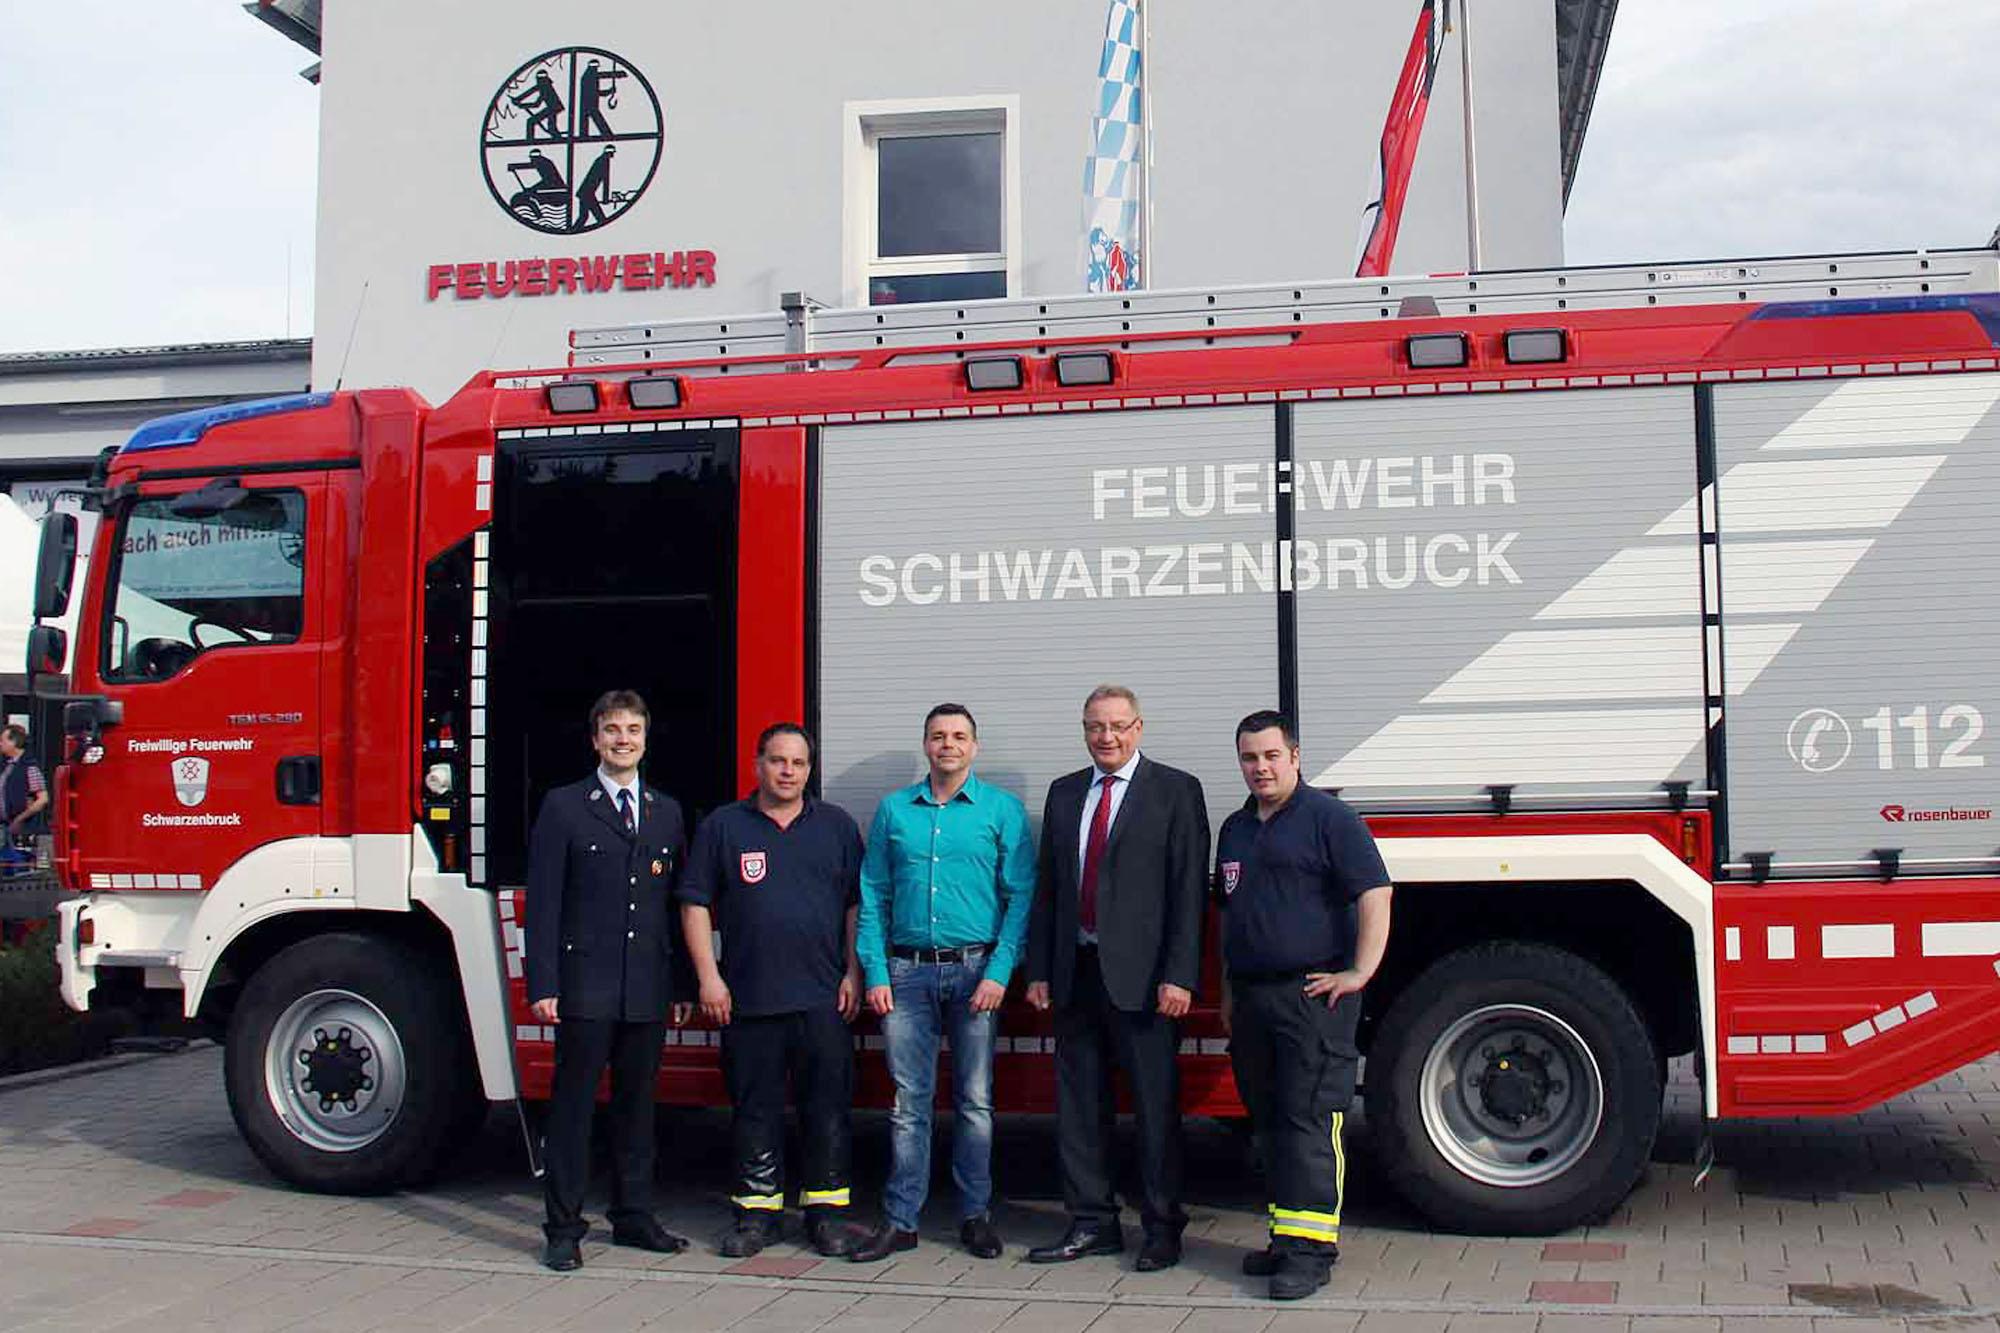 v.l.n.r.: 1. Vorsitzender Wolfgang Söder, Kommandant Christian Eckstein, Diether Zink, Bürgermeister Bernd Ernstberger und stv. Kommandant Florian Bayer.